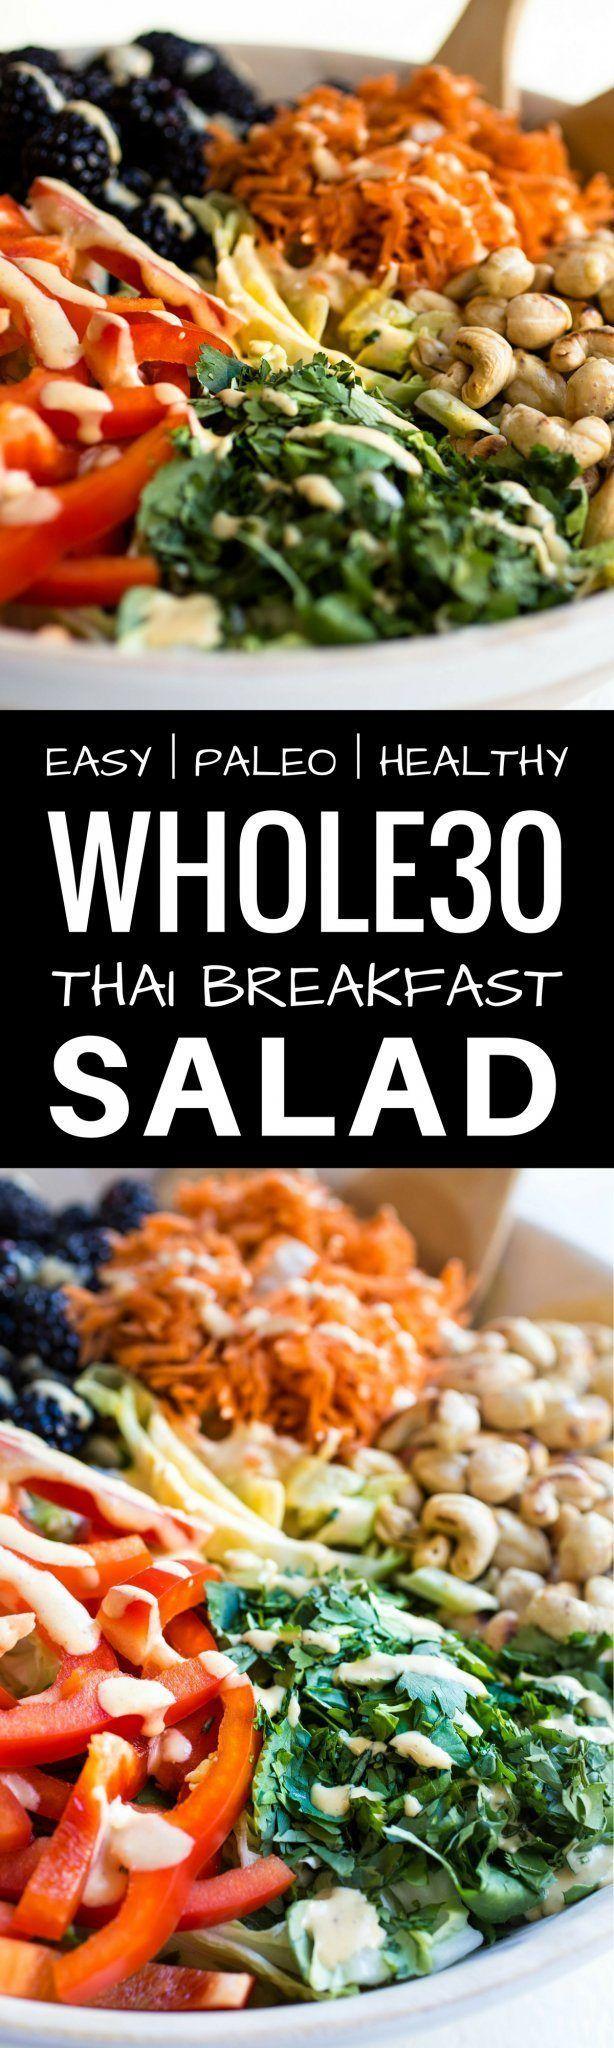 Whole30 Thai Breakfast Bowl Recipe. | Posted By: DebbieNet.com